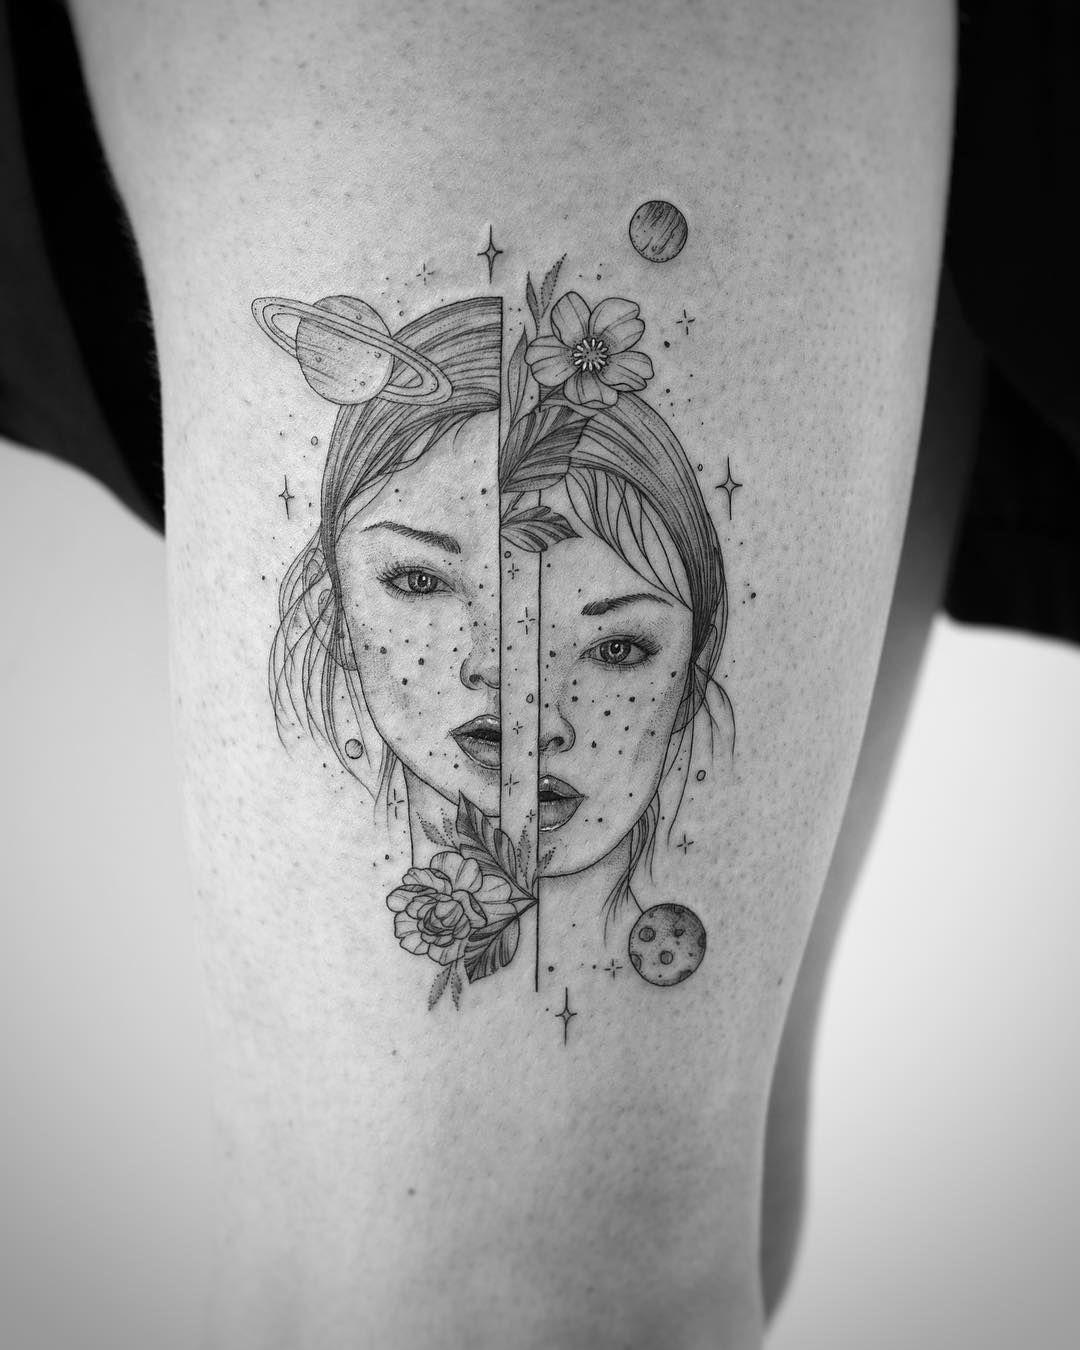 Fine Line Tattoo By Jessica Joy Artwoonz Tattoo Artwoonz Line Tattoos Fine Line Tattoos Fantasy Tattoos